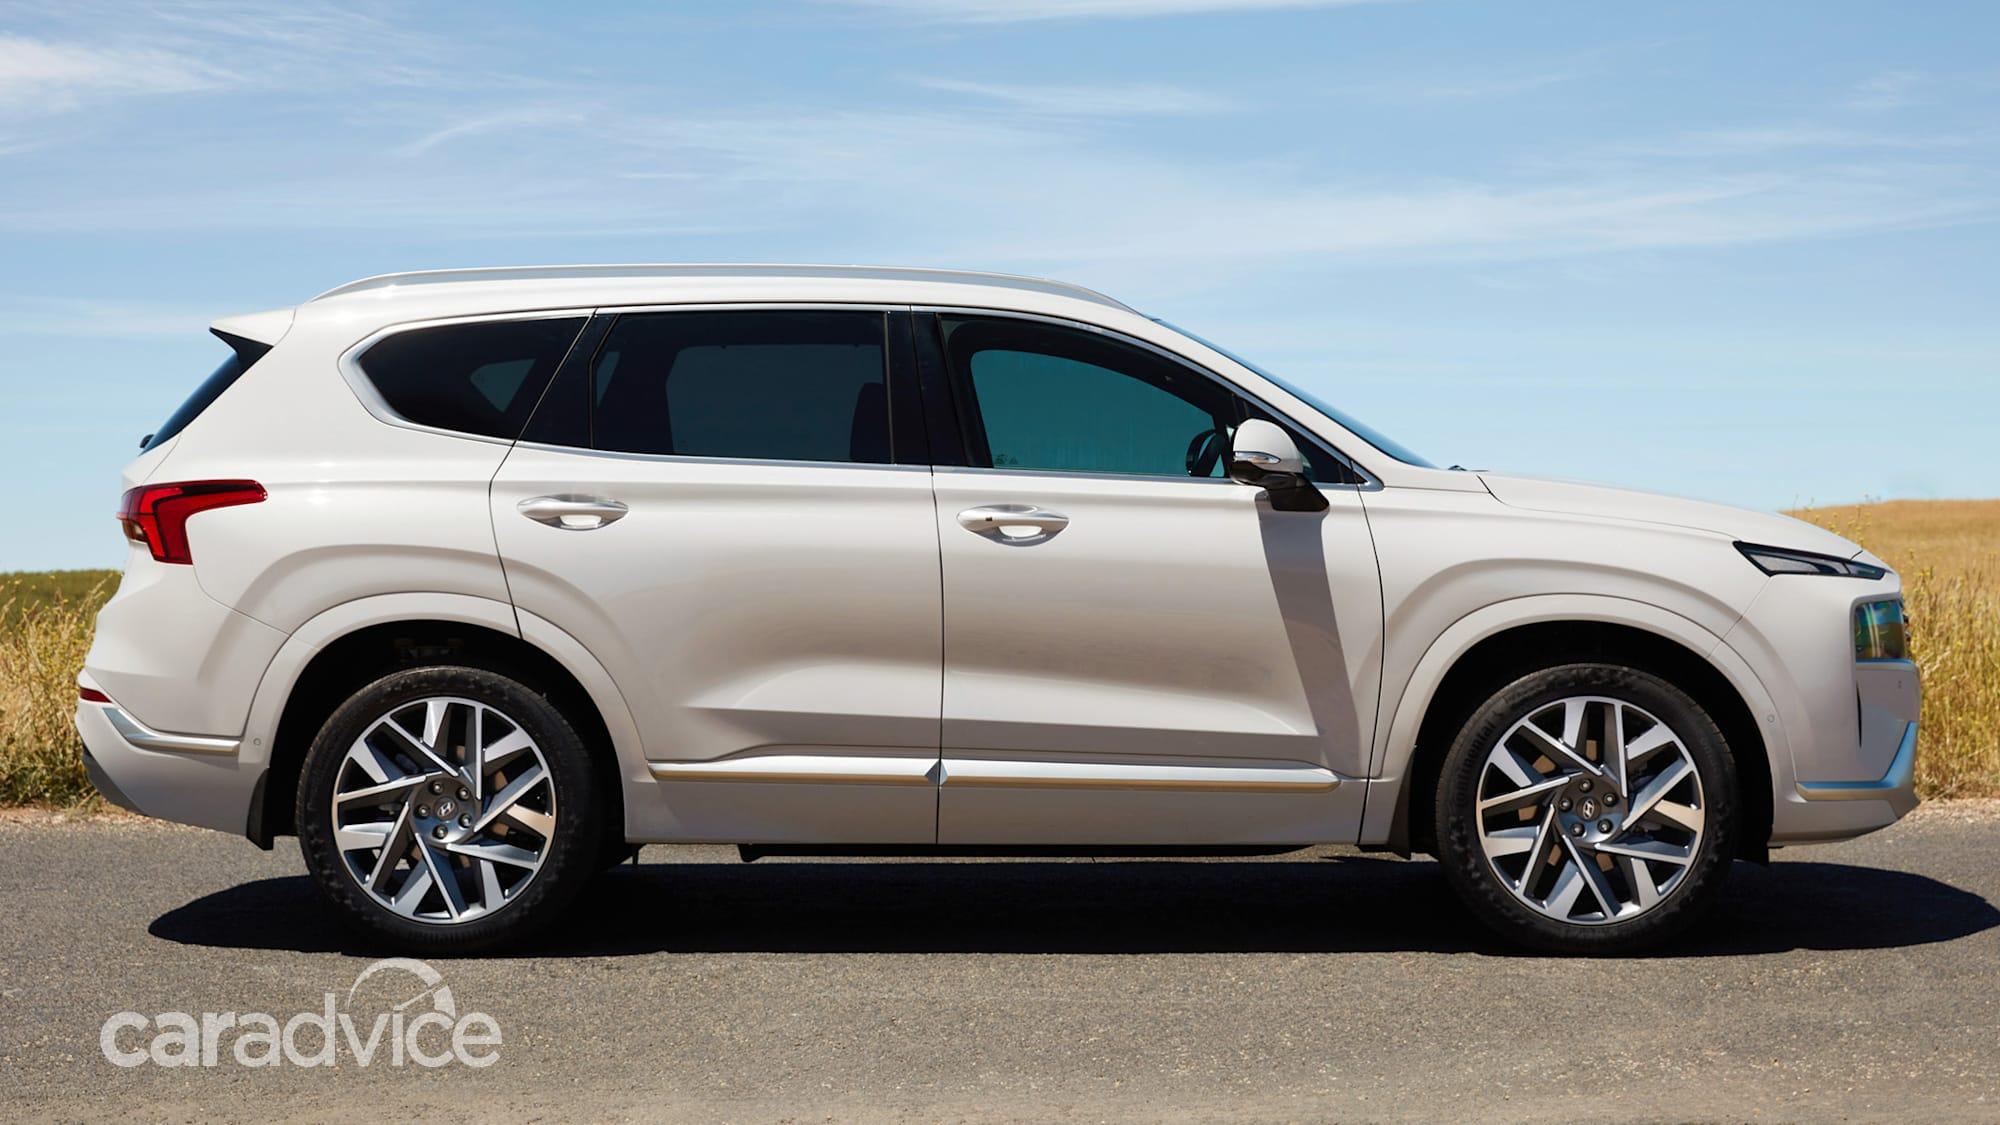 2021 Hyundai Santa Fe price and specs: More kit, price ...